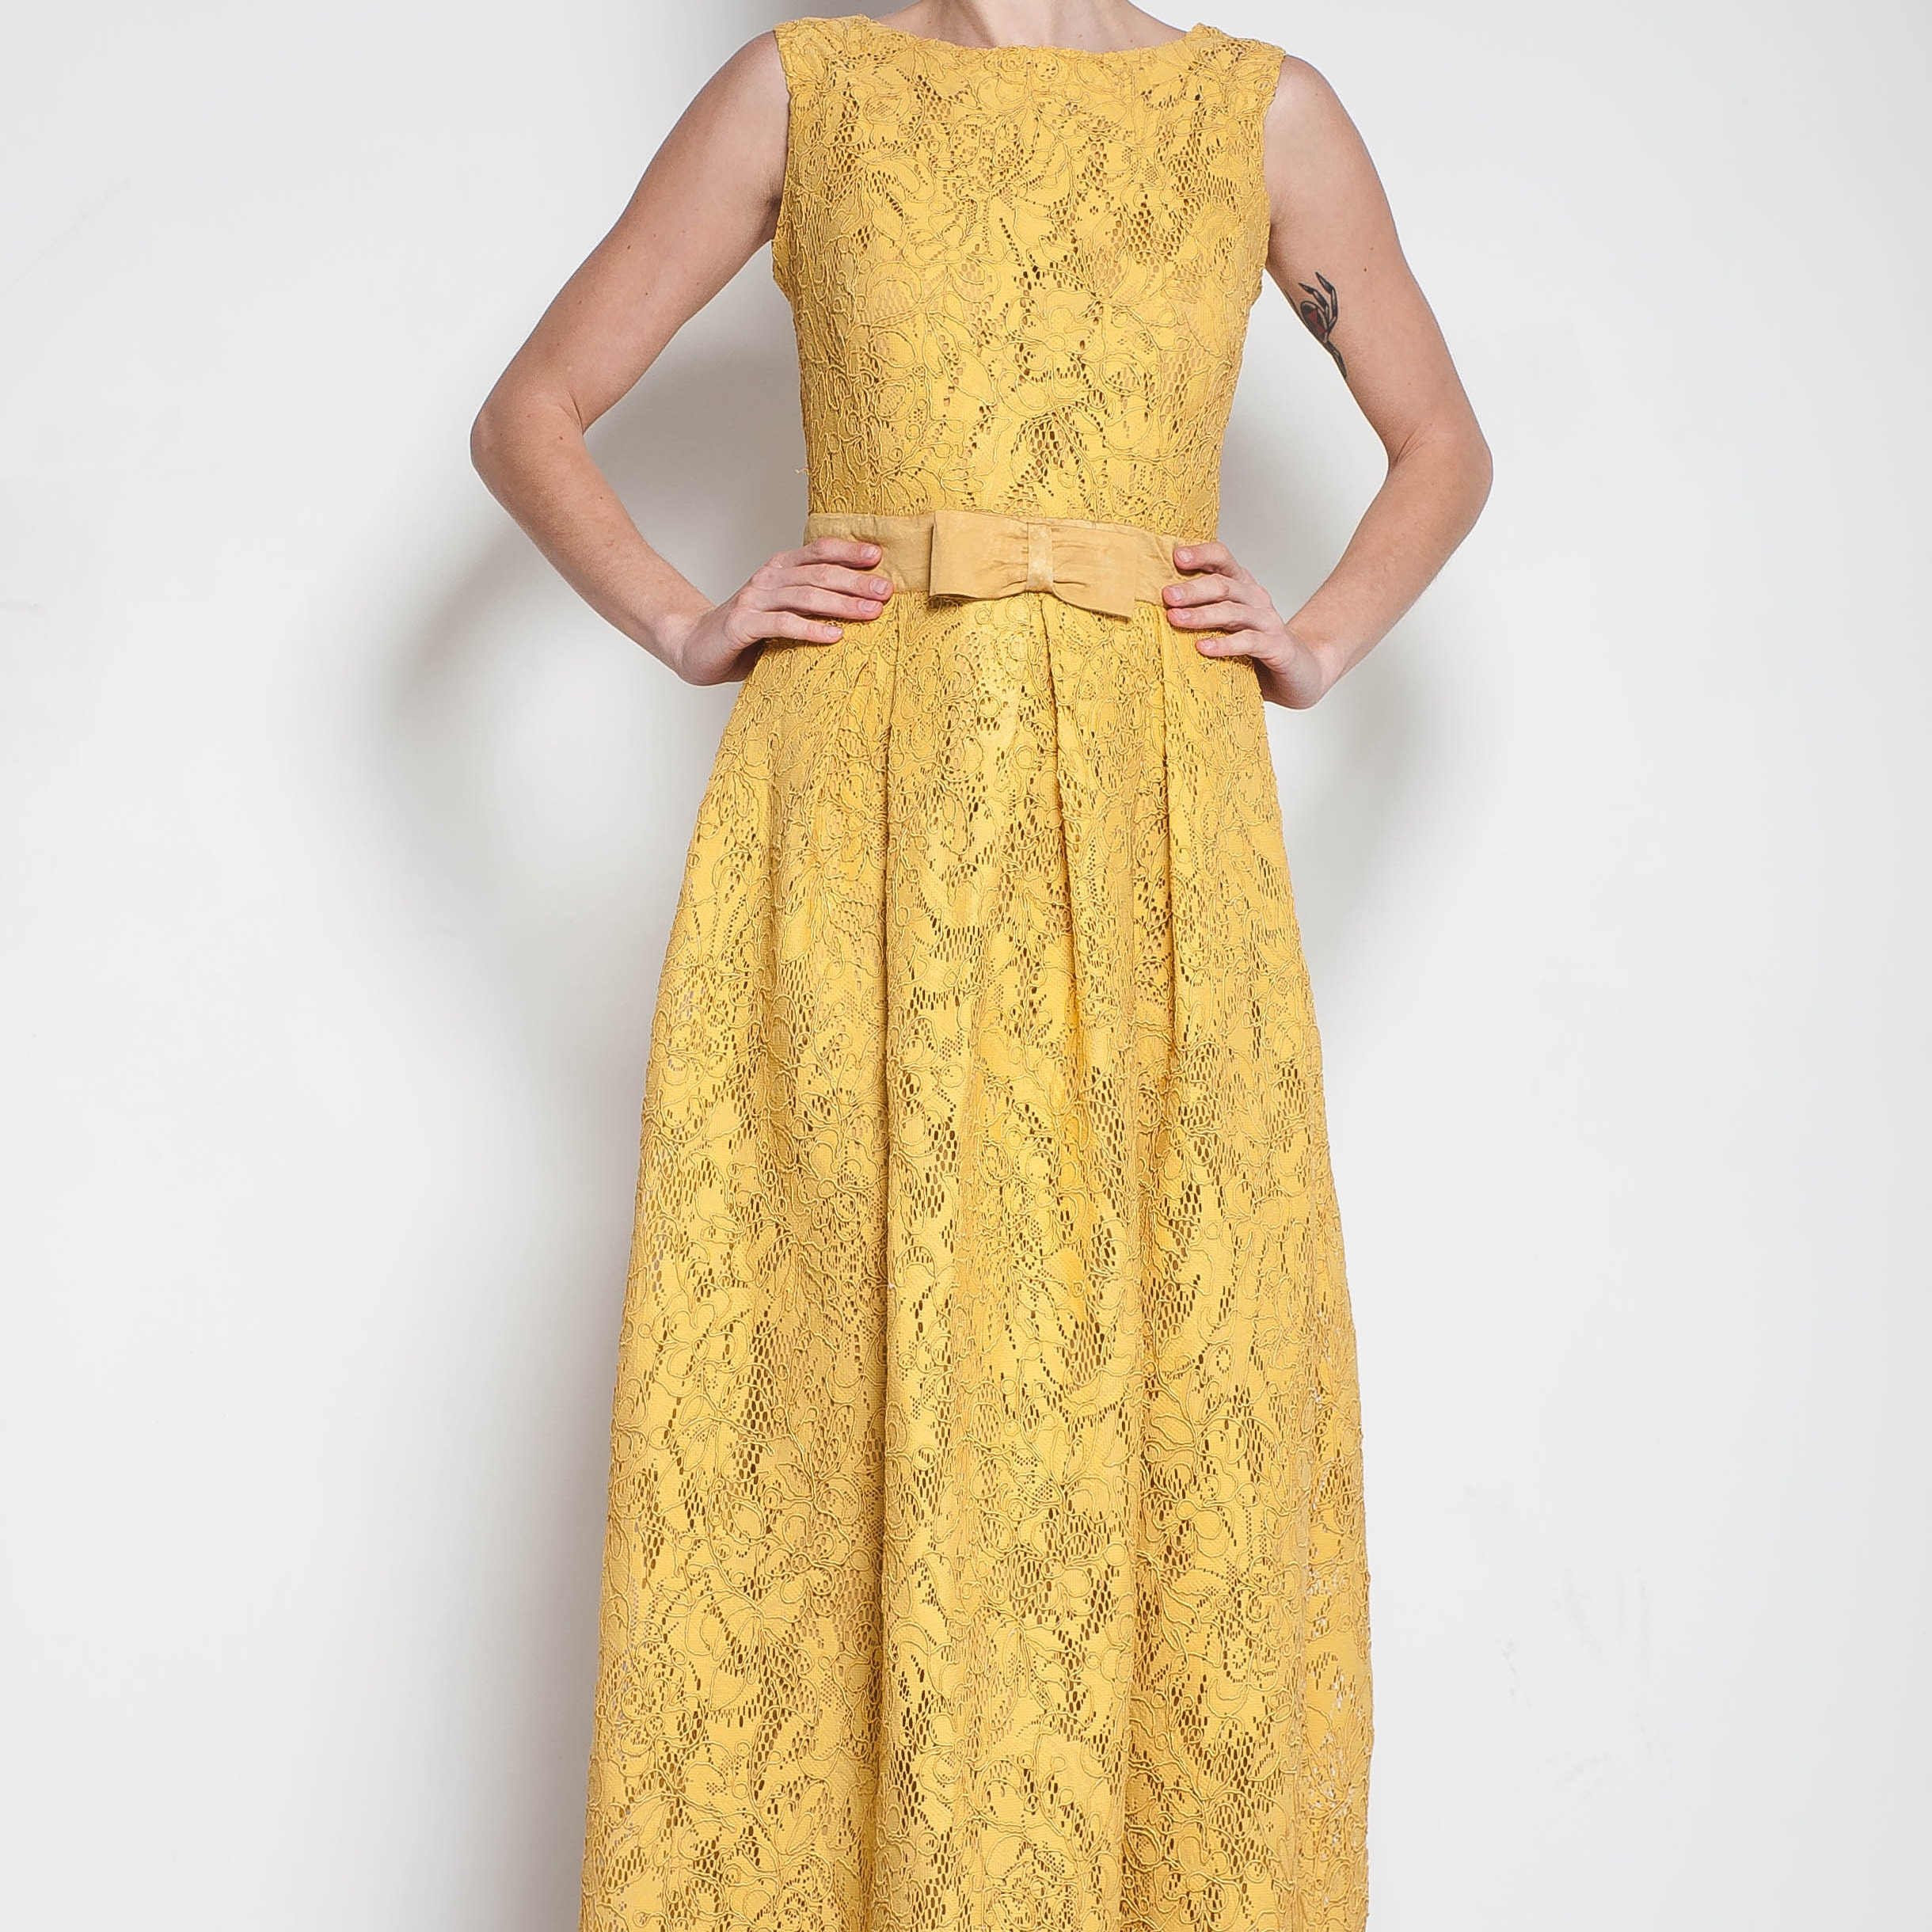 Häkeln Kleid häkeln Spitzen Kleid kleine rosa Kleid Häkeln